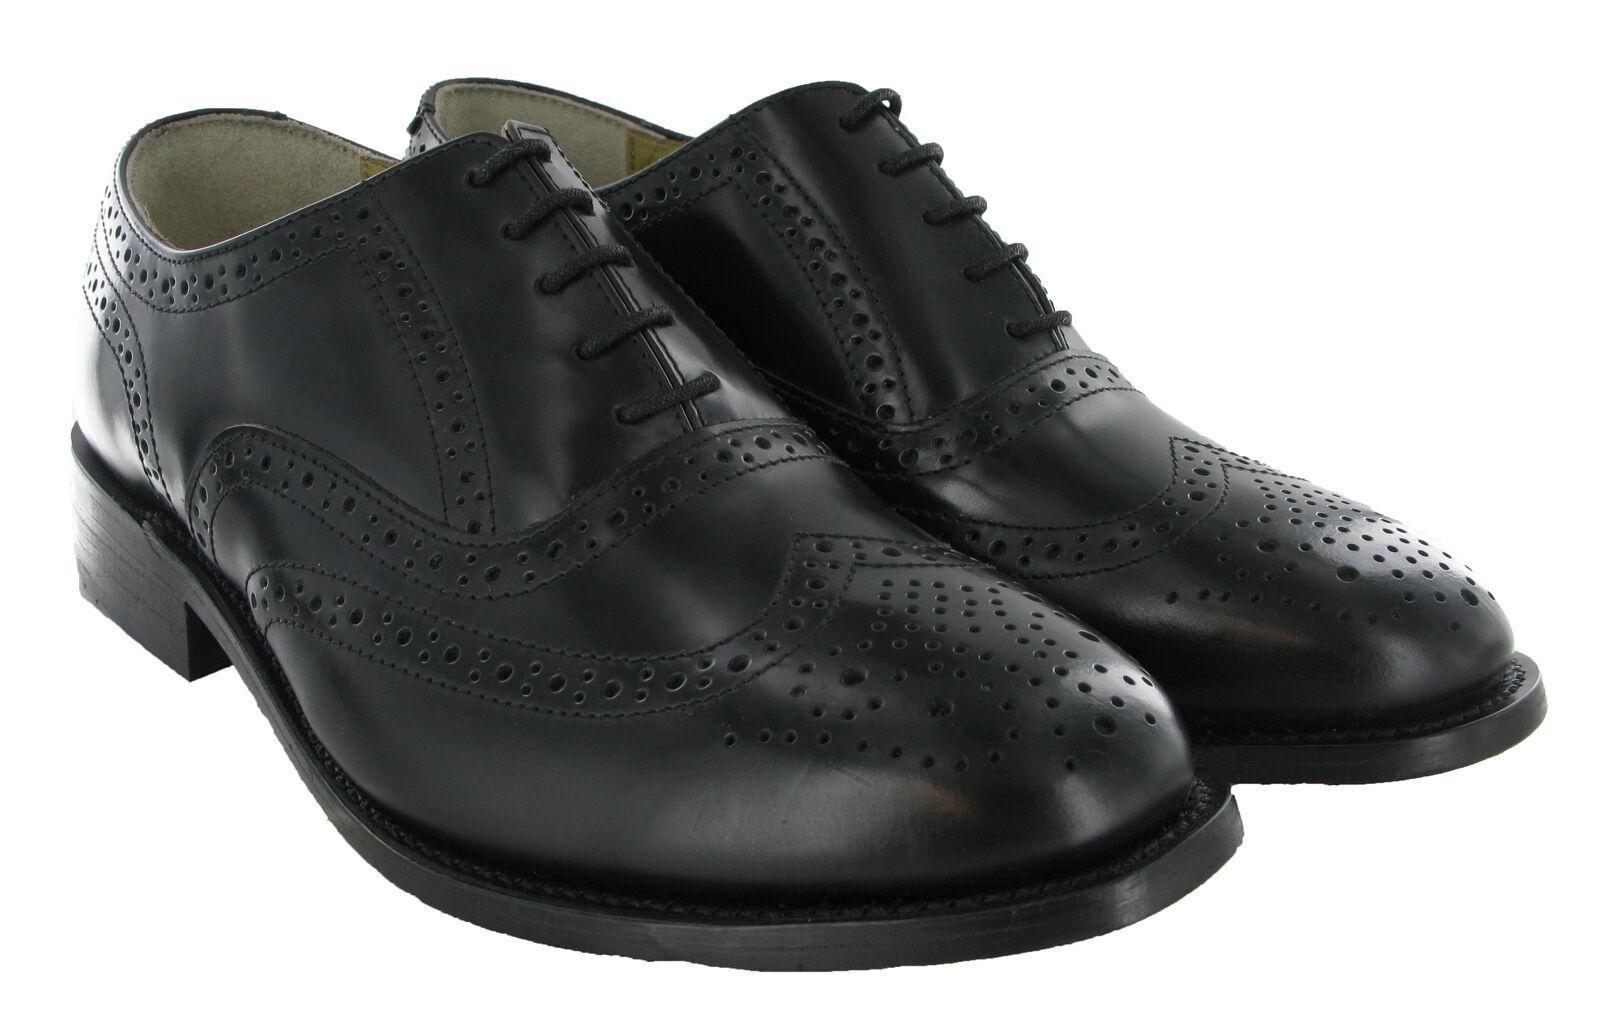 a25e1ea8336a Kensington Wing Cap Brogue Oxford Herren Leder Goodyear Rahmengenähte  Schuhe UK6-14